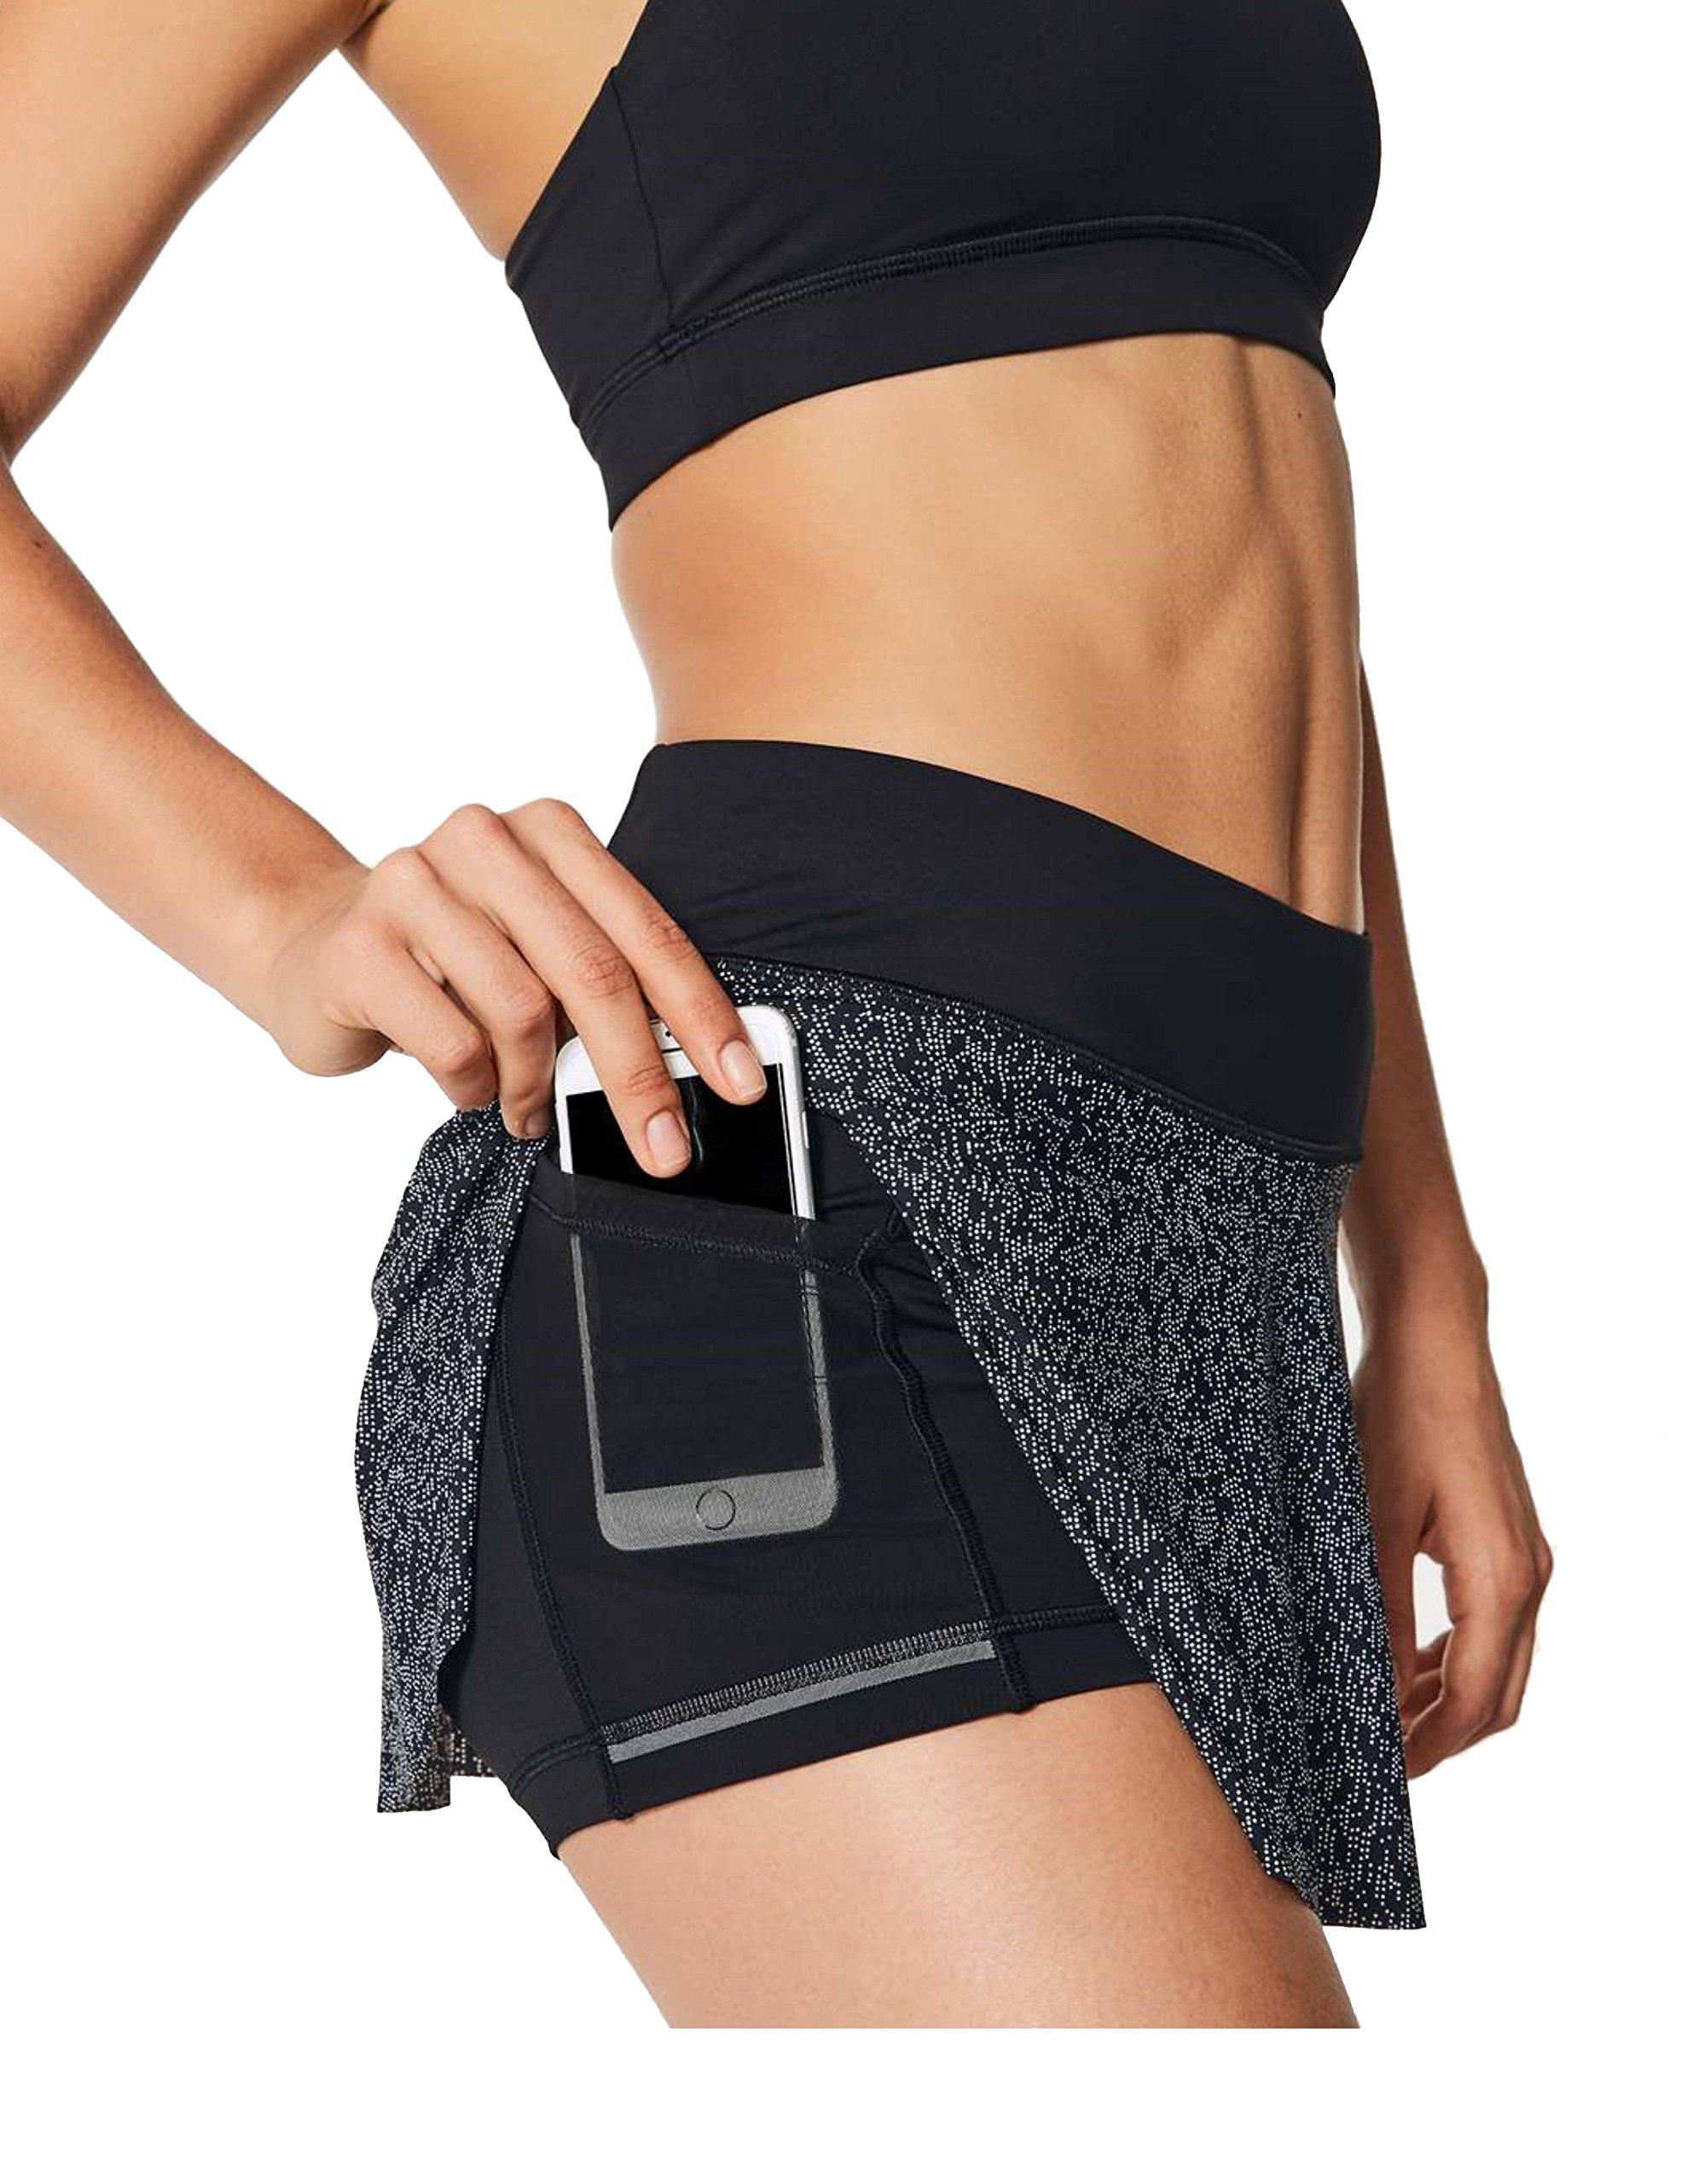 Lululemon Women's Quick Pace Skirt Size 6